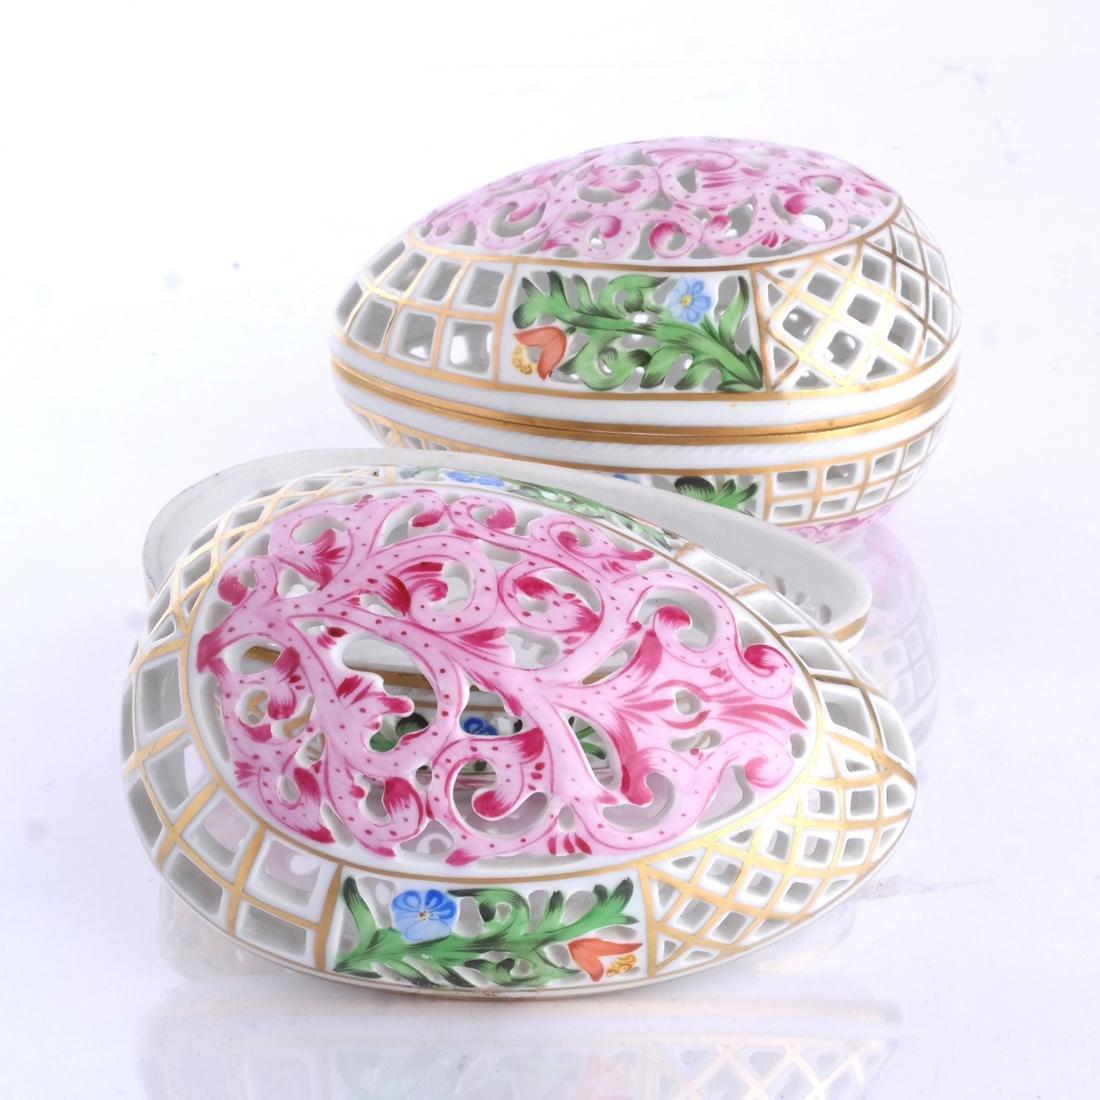 Herend Porcelain Decorative Articles - 4